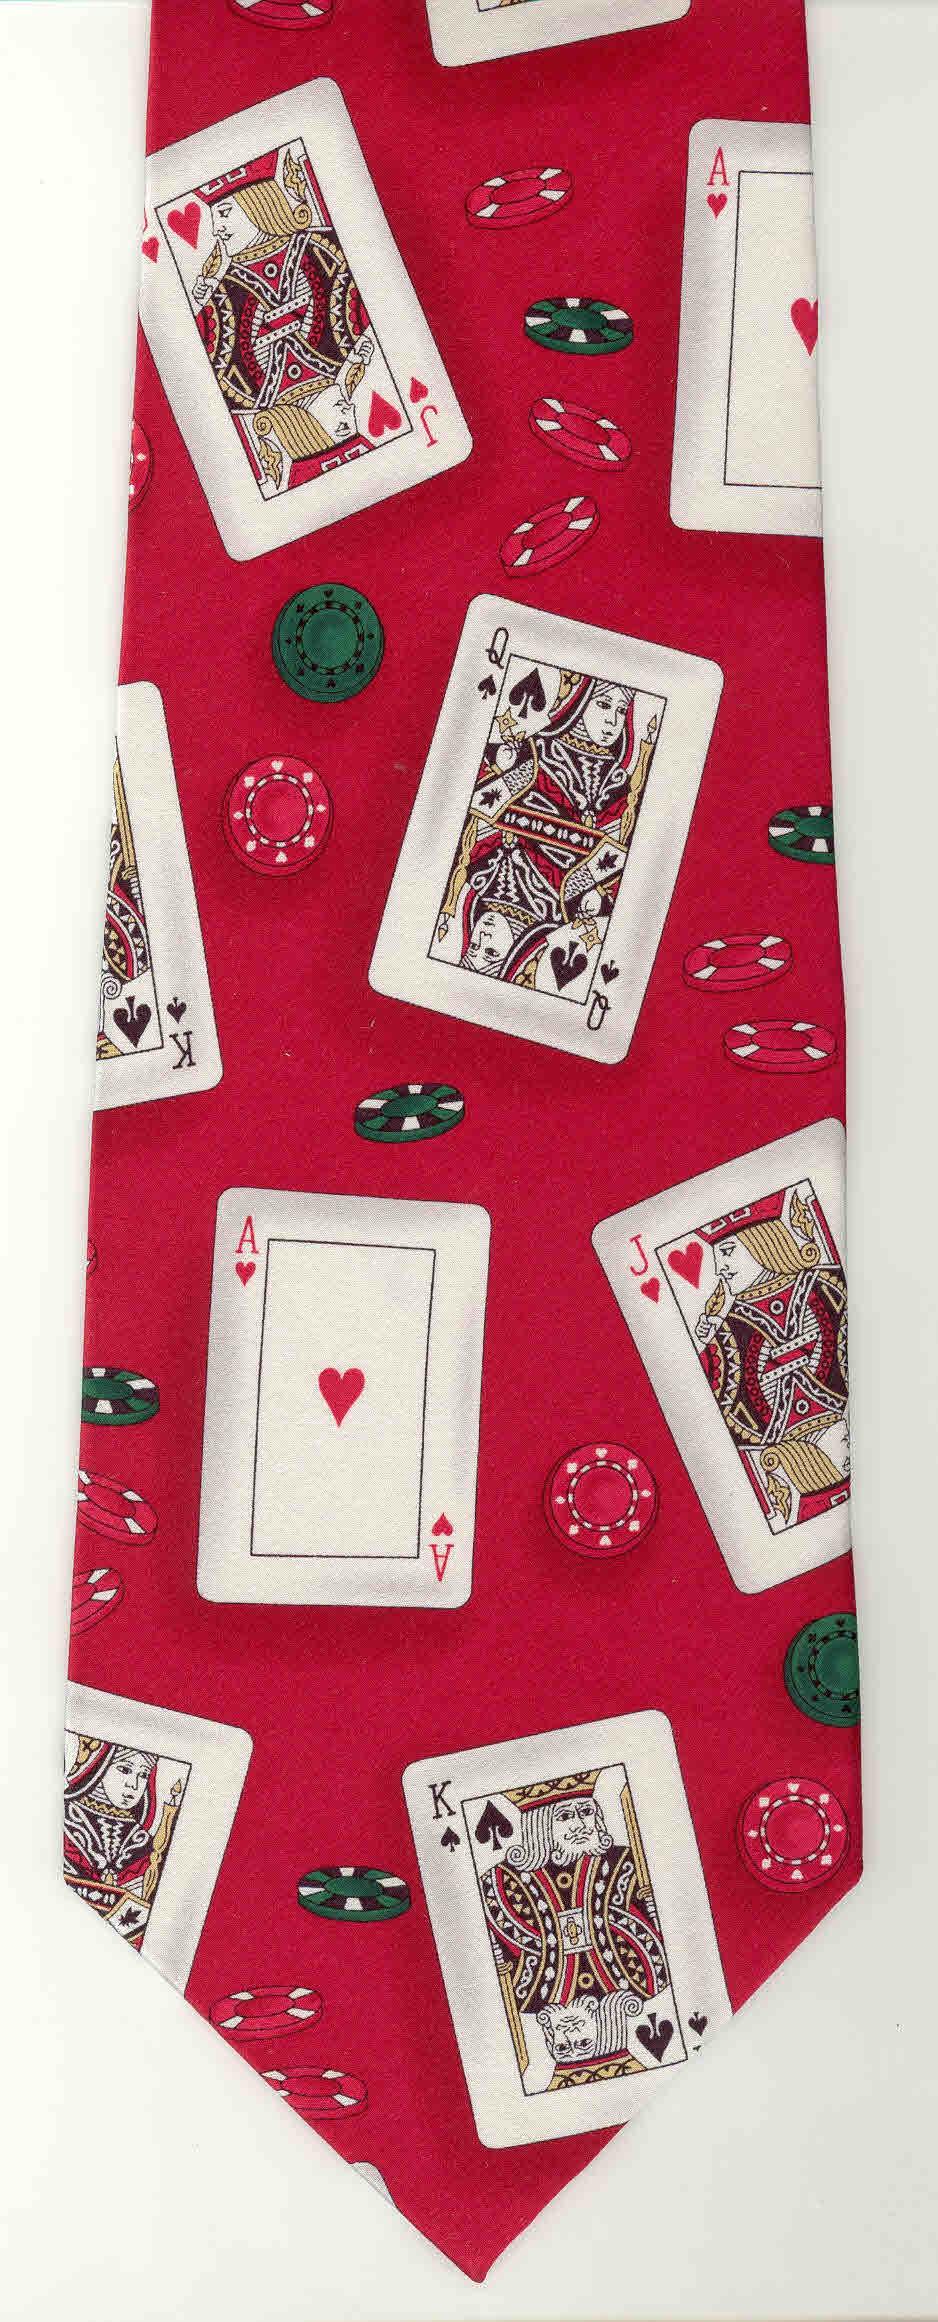 004 Card & Chips.jpg